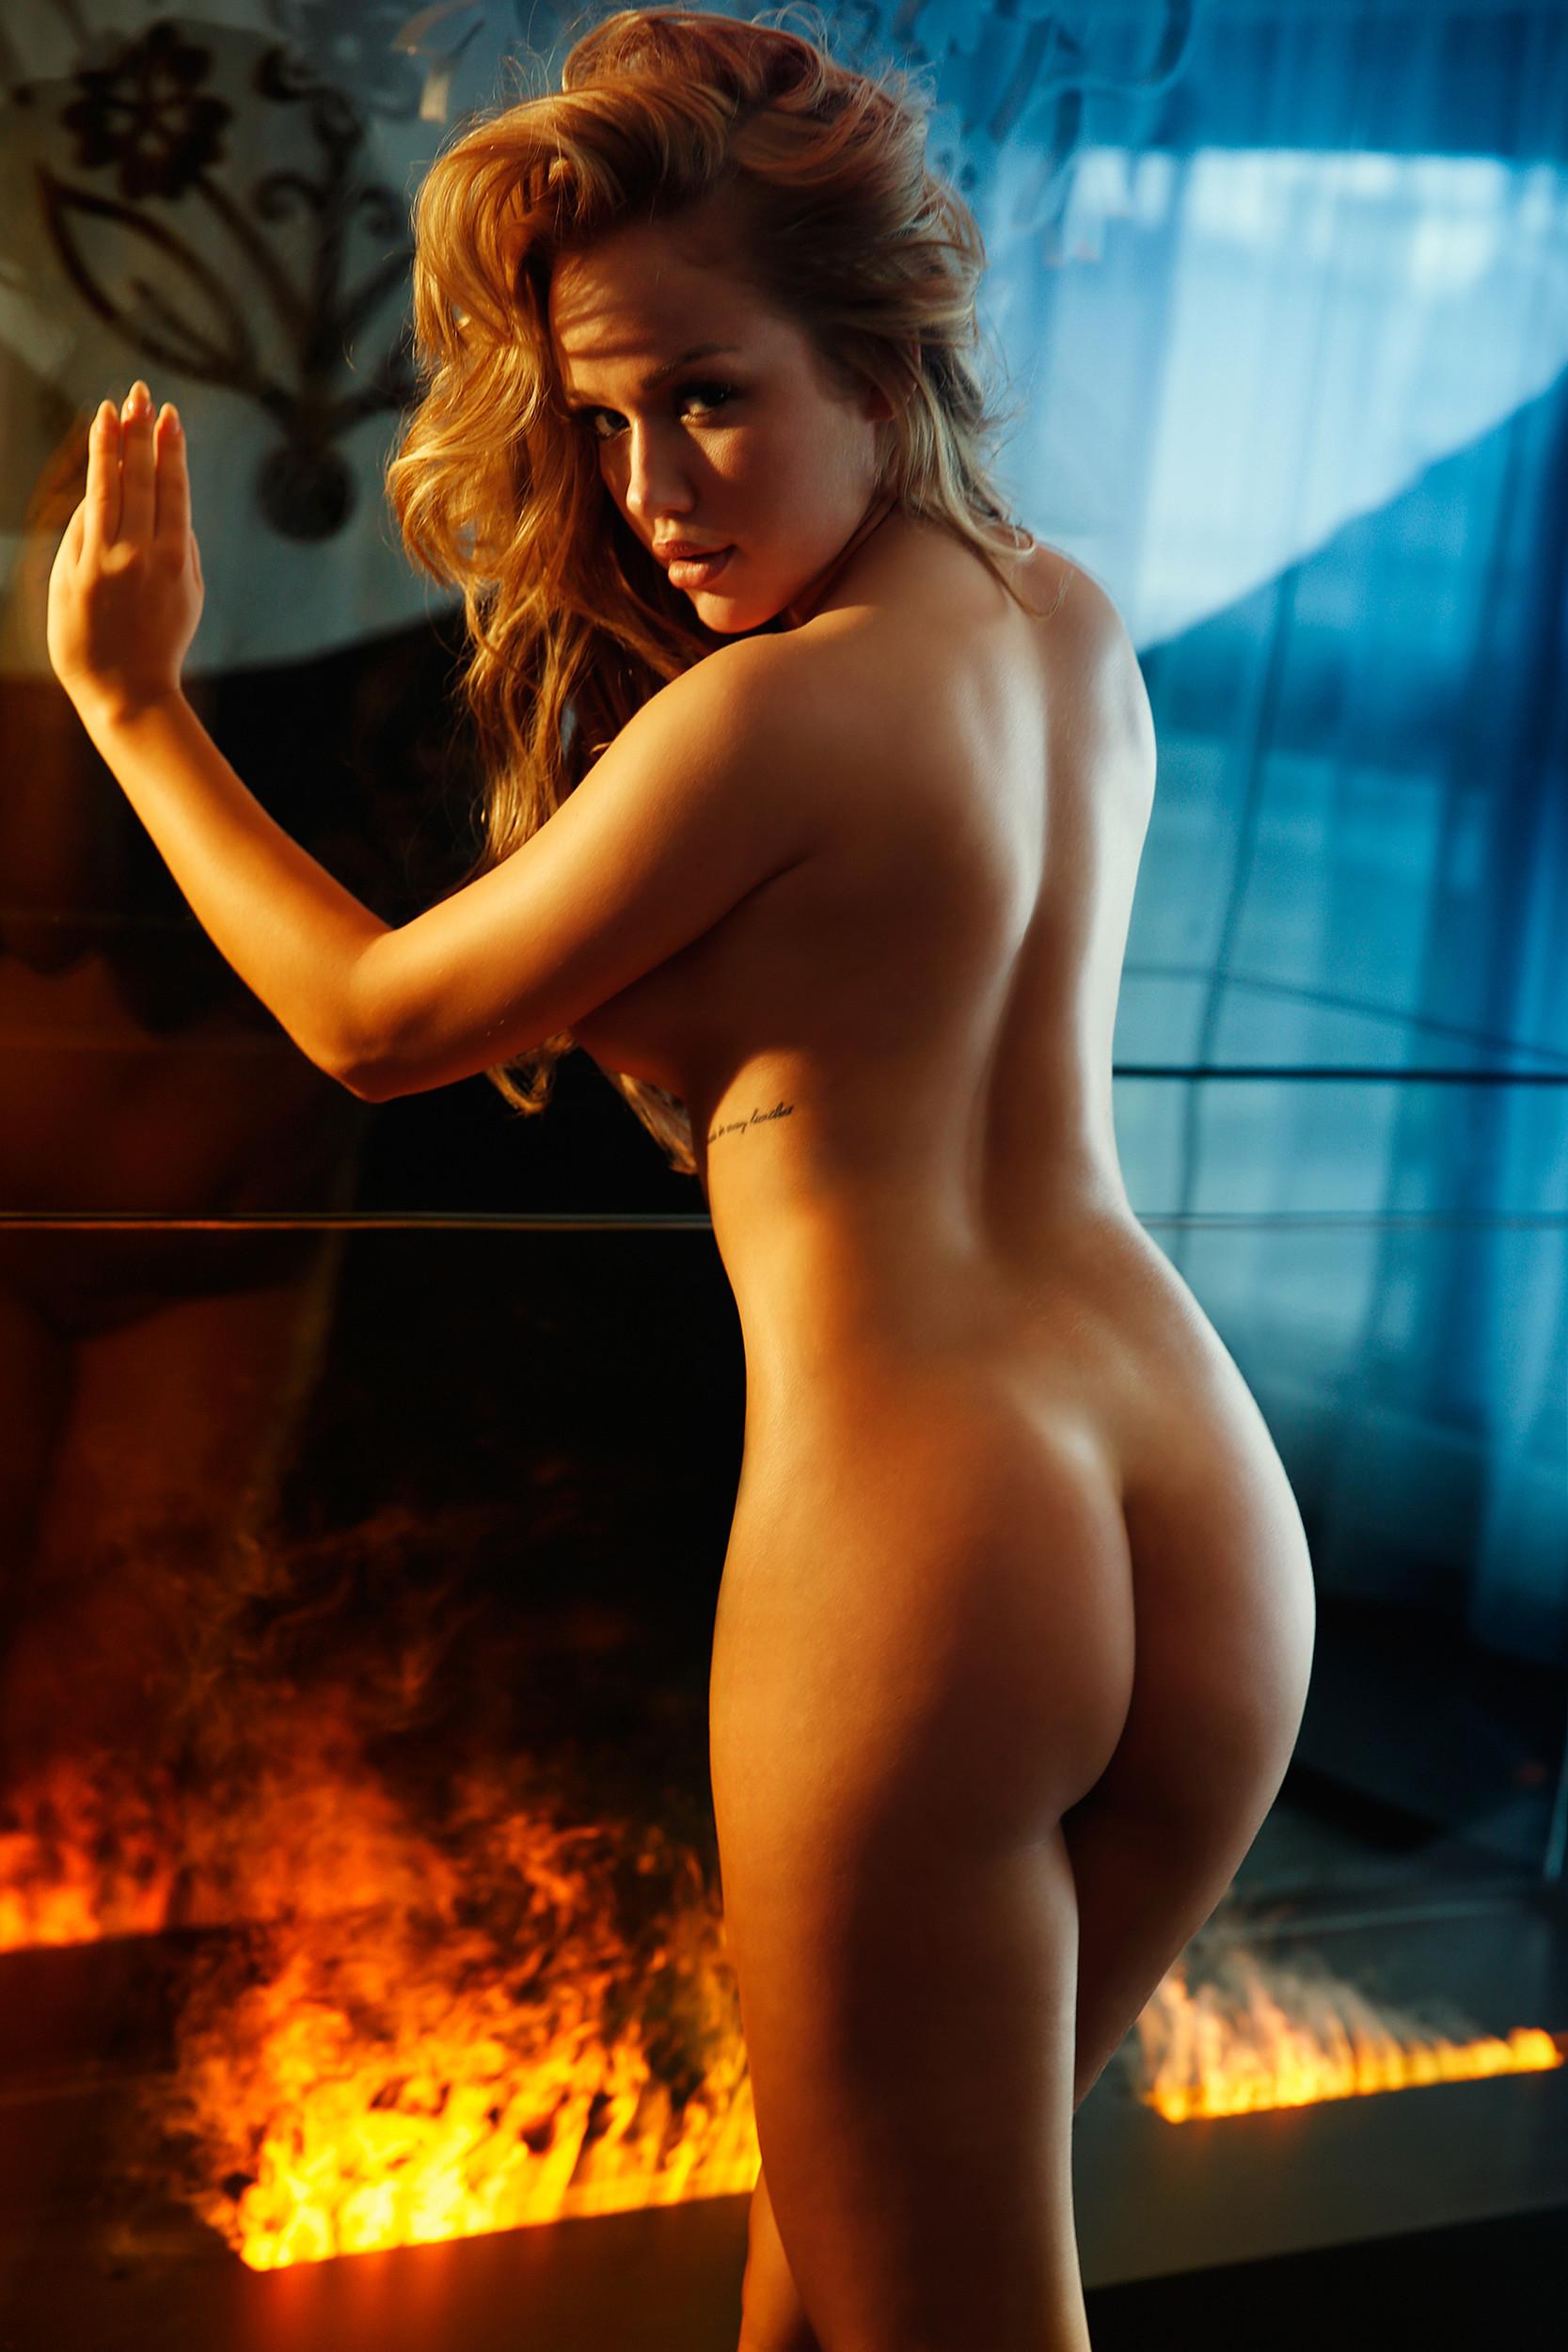 Nude merritt patterson Merritt patterson